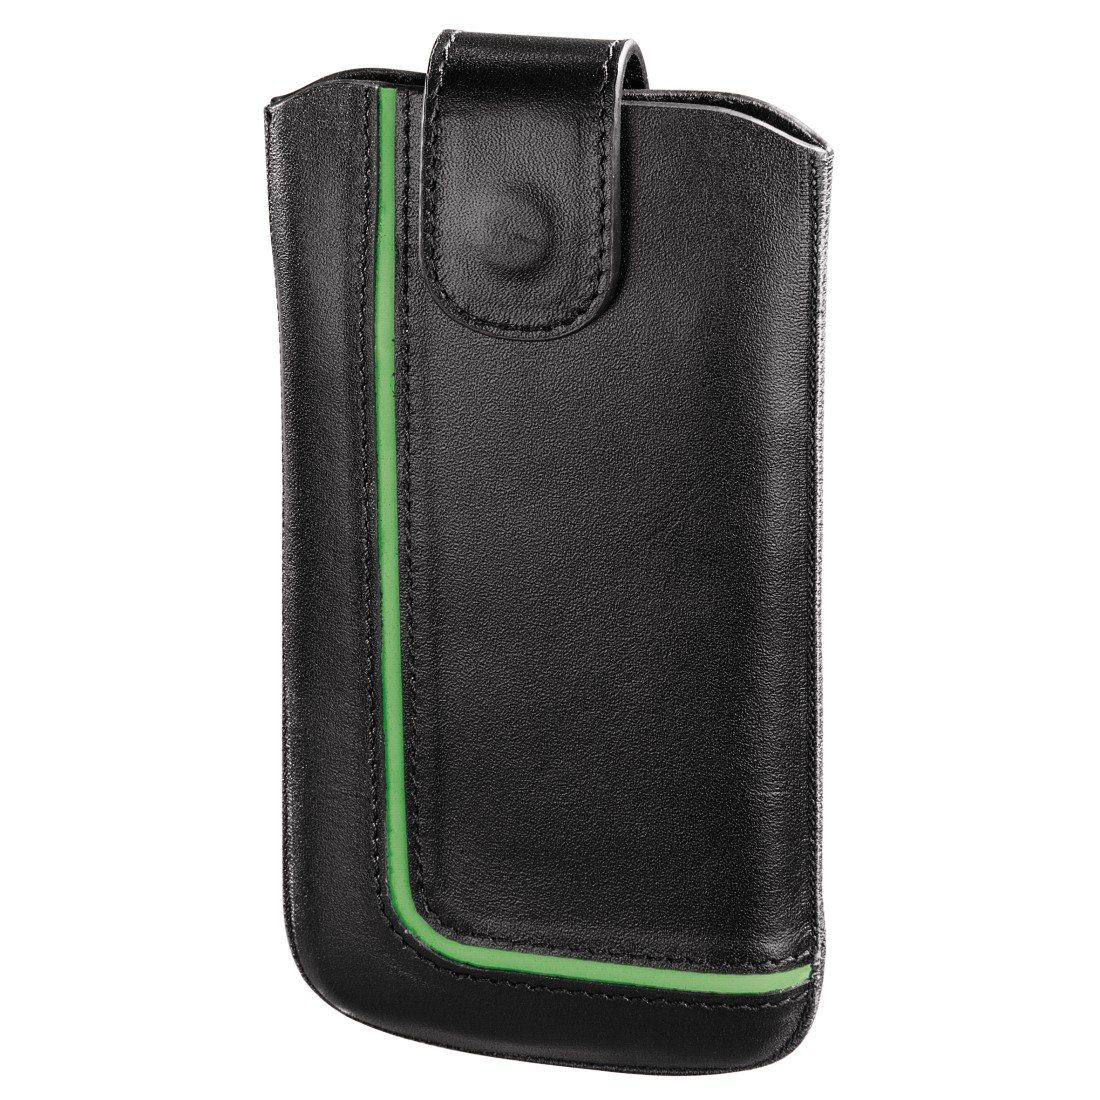 Hama Handy-Sleeve Neon Black, Gr. XL, Schwarz/Grün